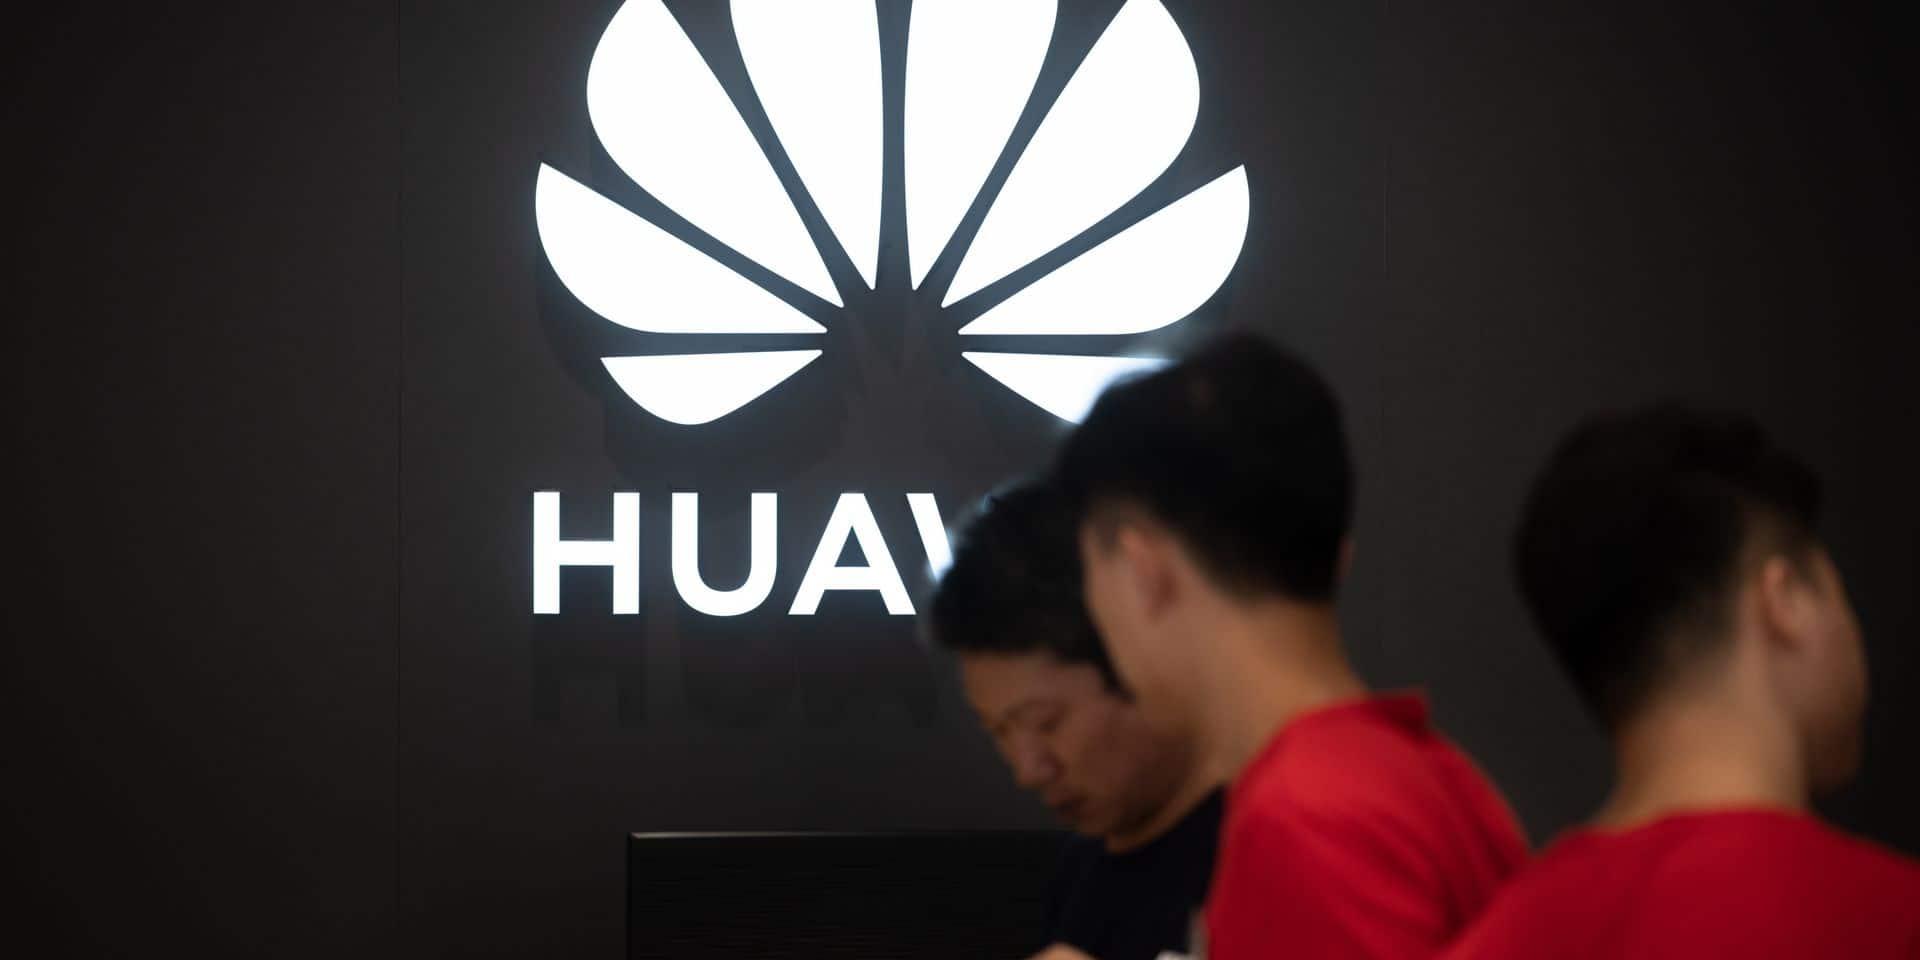 Smartphones: Huawei accuse le coup en Europe (étude)